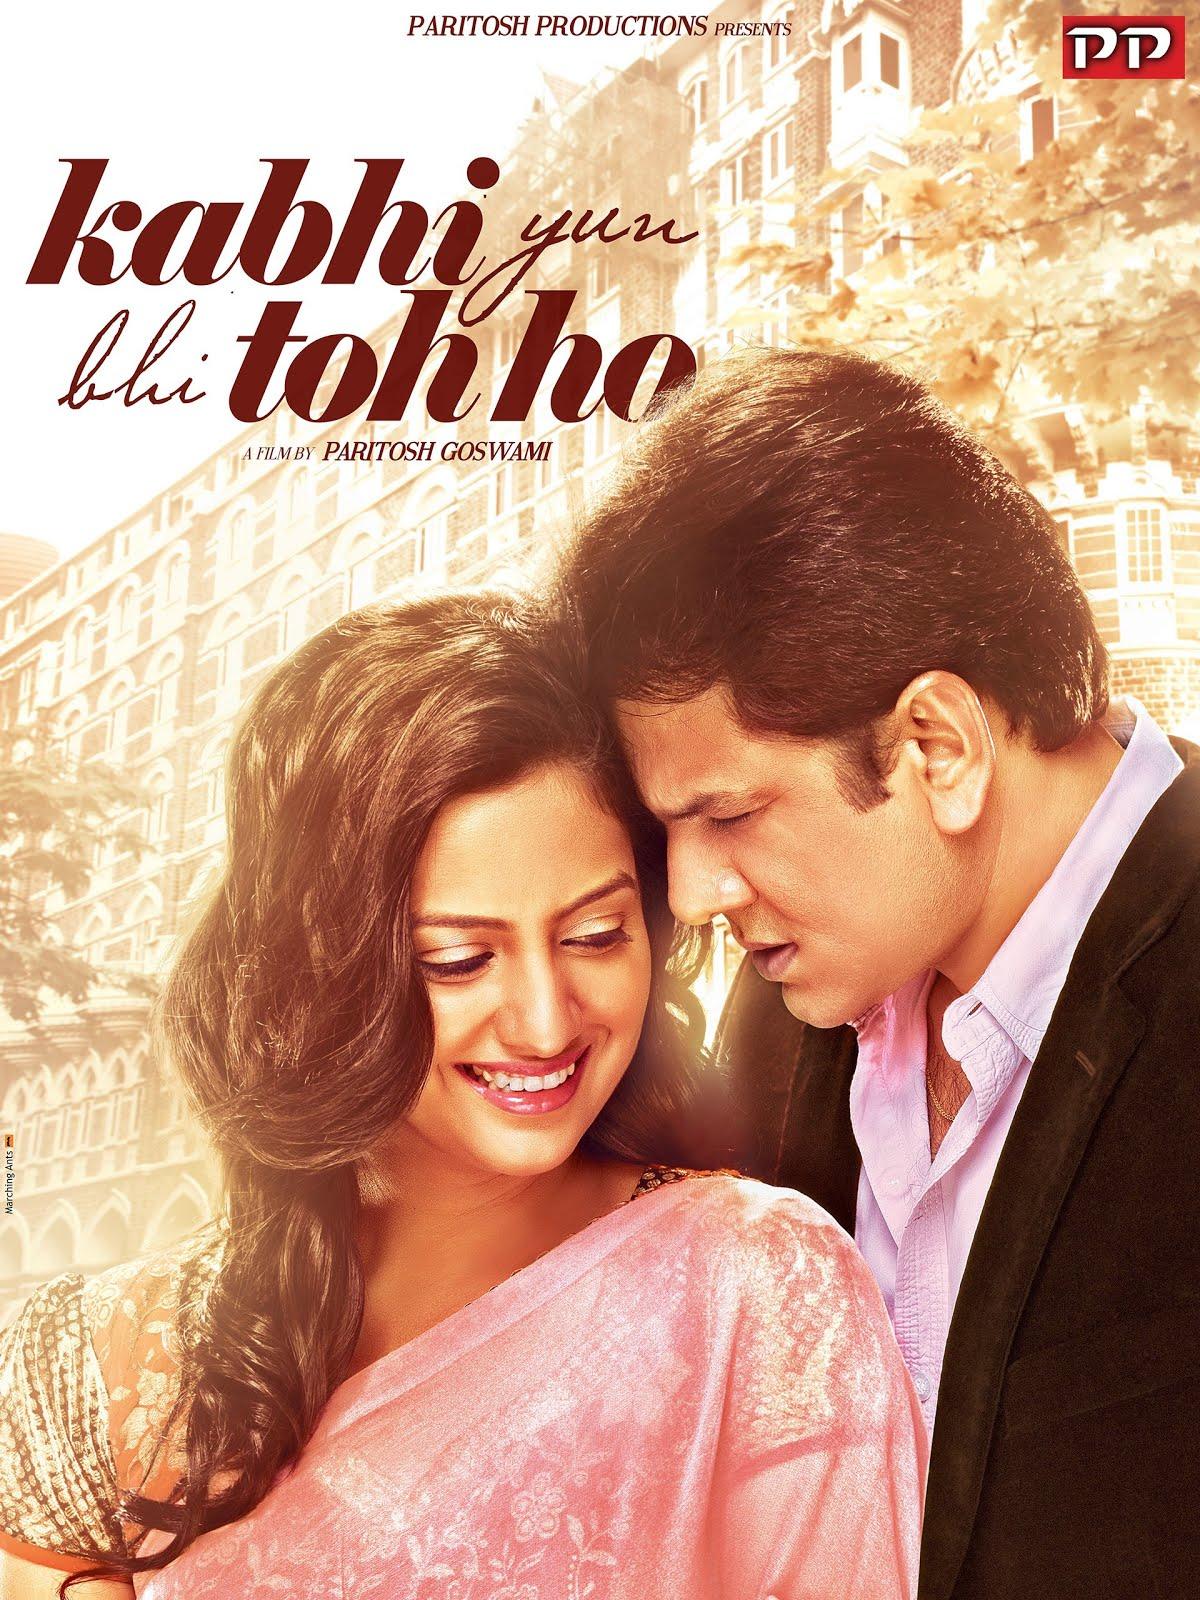 Kabhi Yun Bhi Toh Ho Movie (2014) Hindi Full Movie 300MB HDRip 480p x264 Download